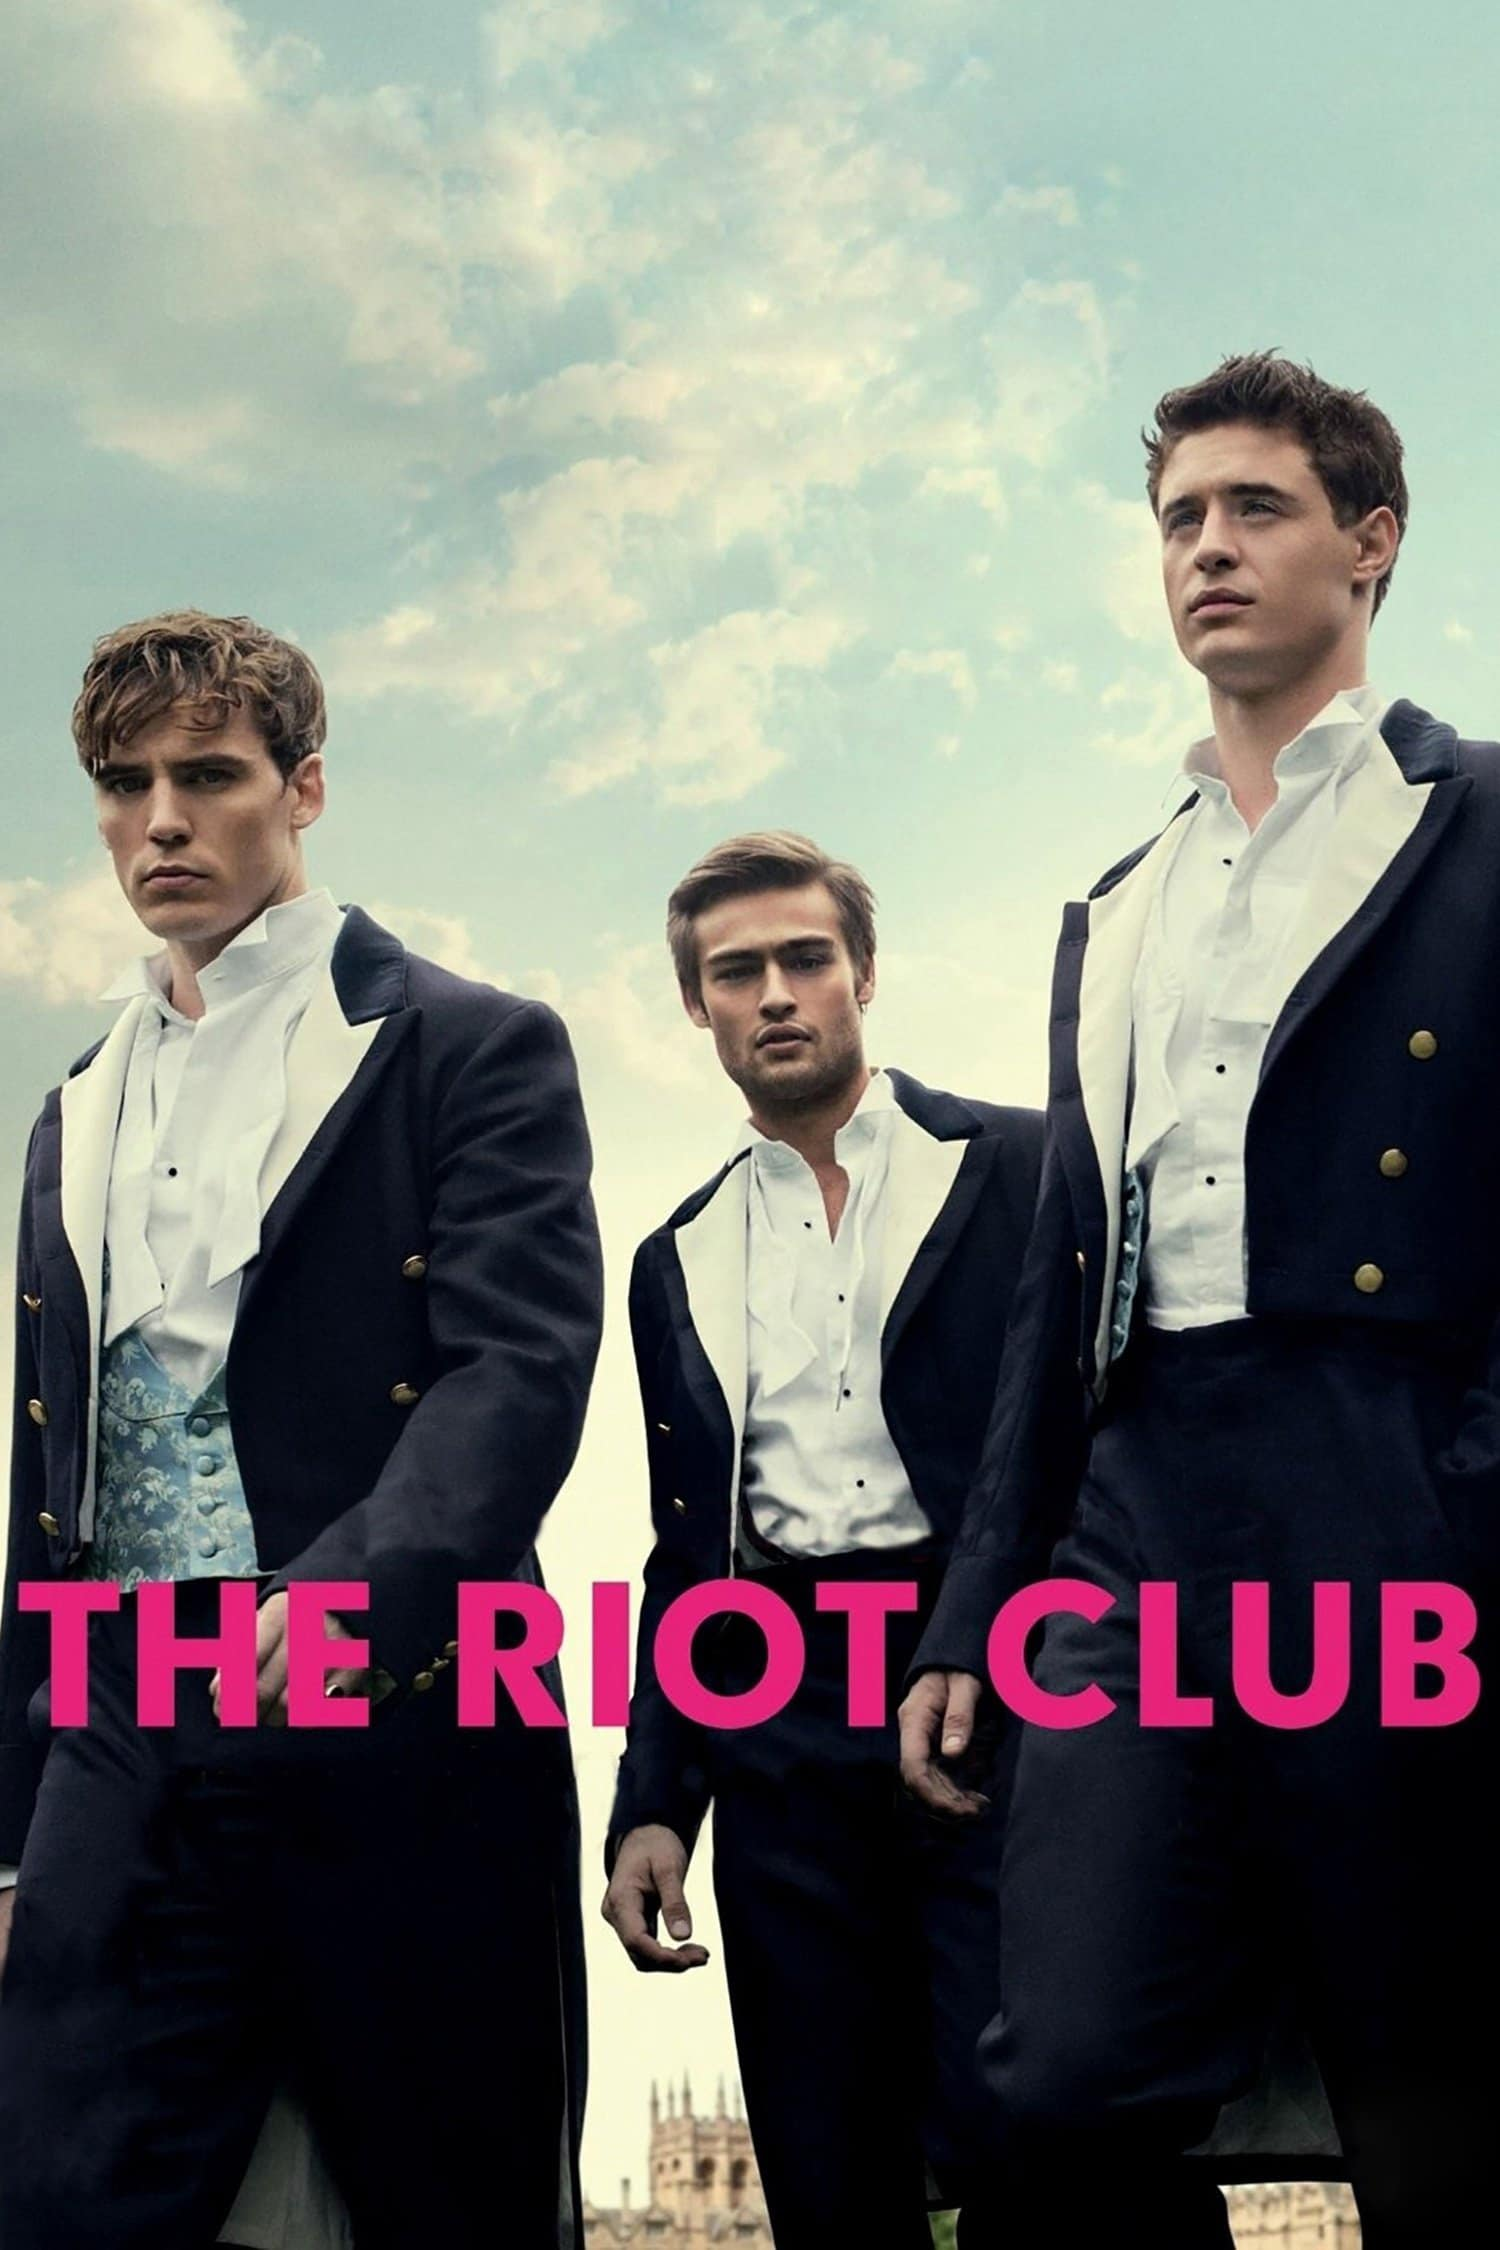 The Riot Club, 2014